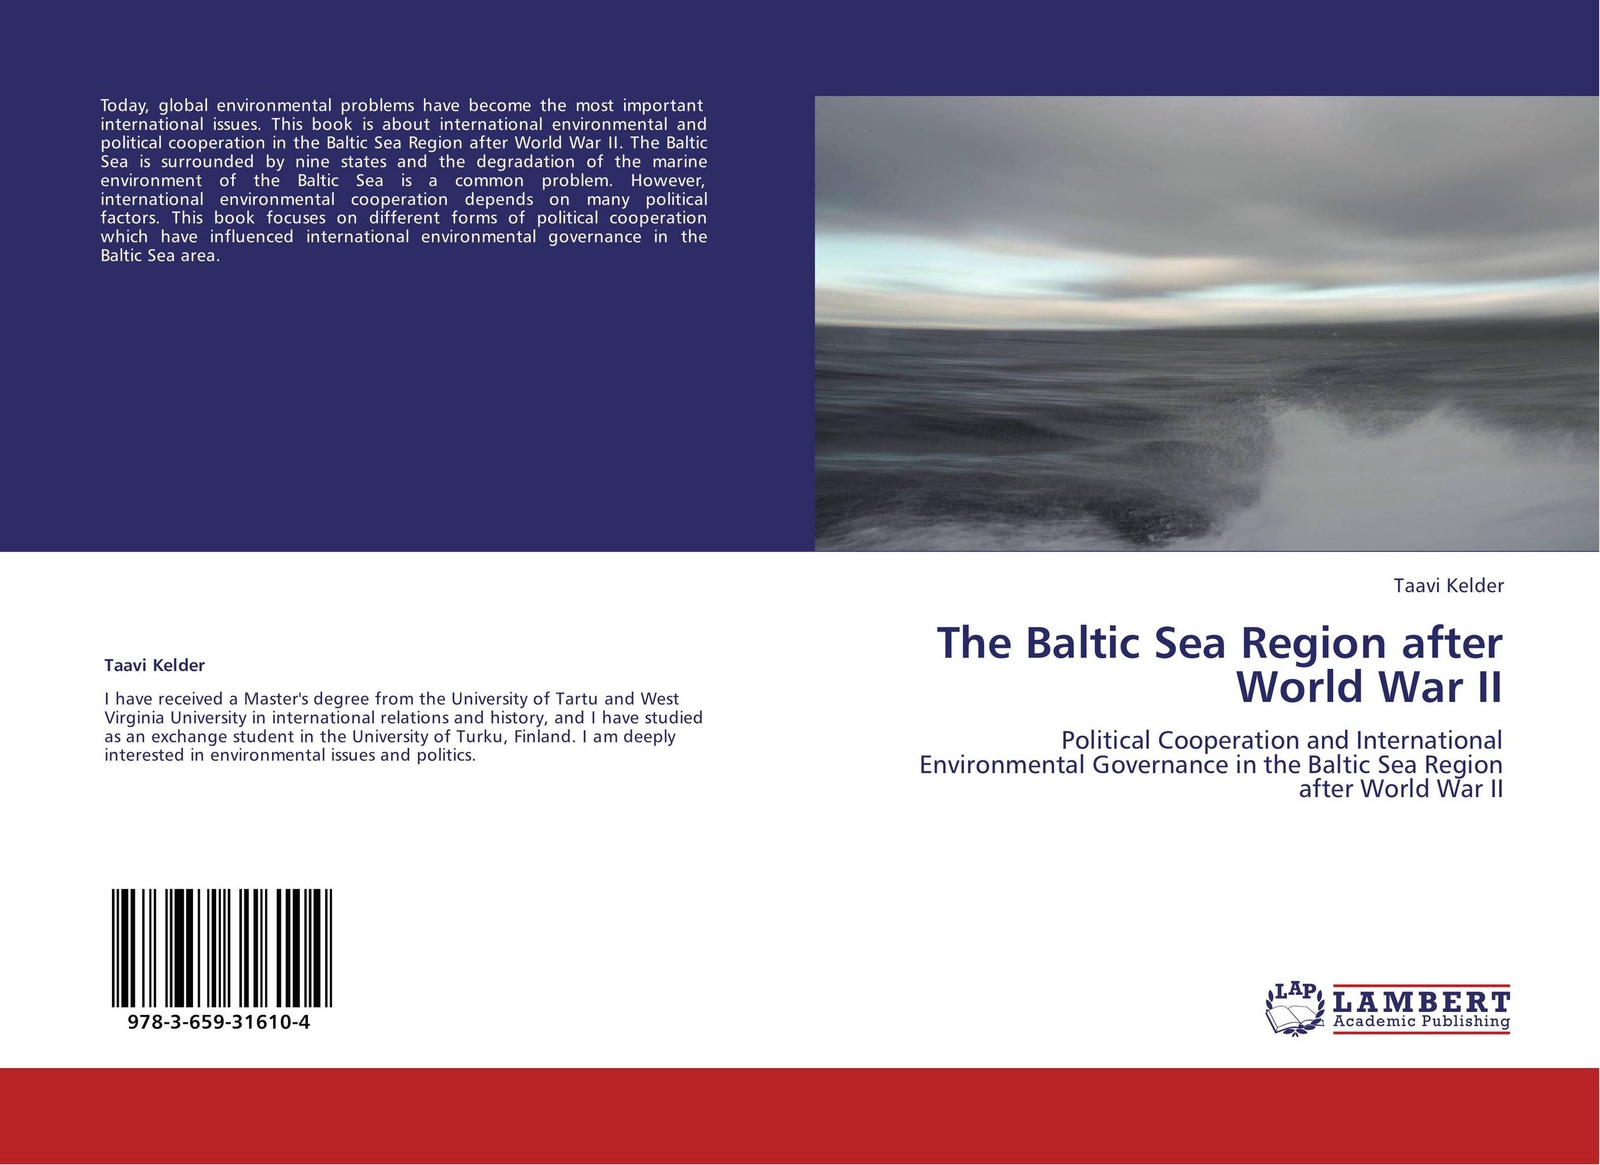 лучшая цена Taavi Kelder The Baltic Sea Region after World War II